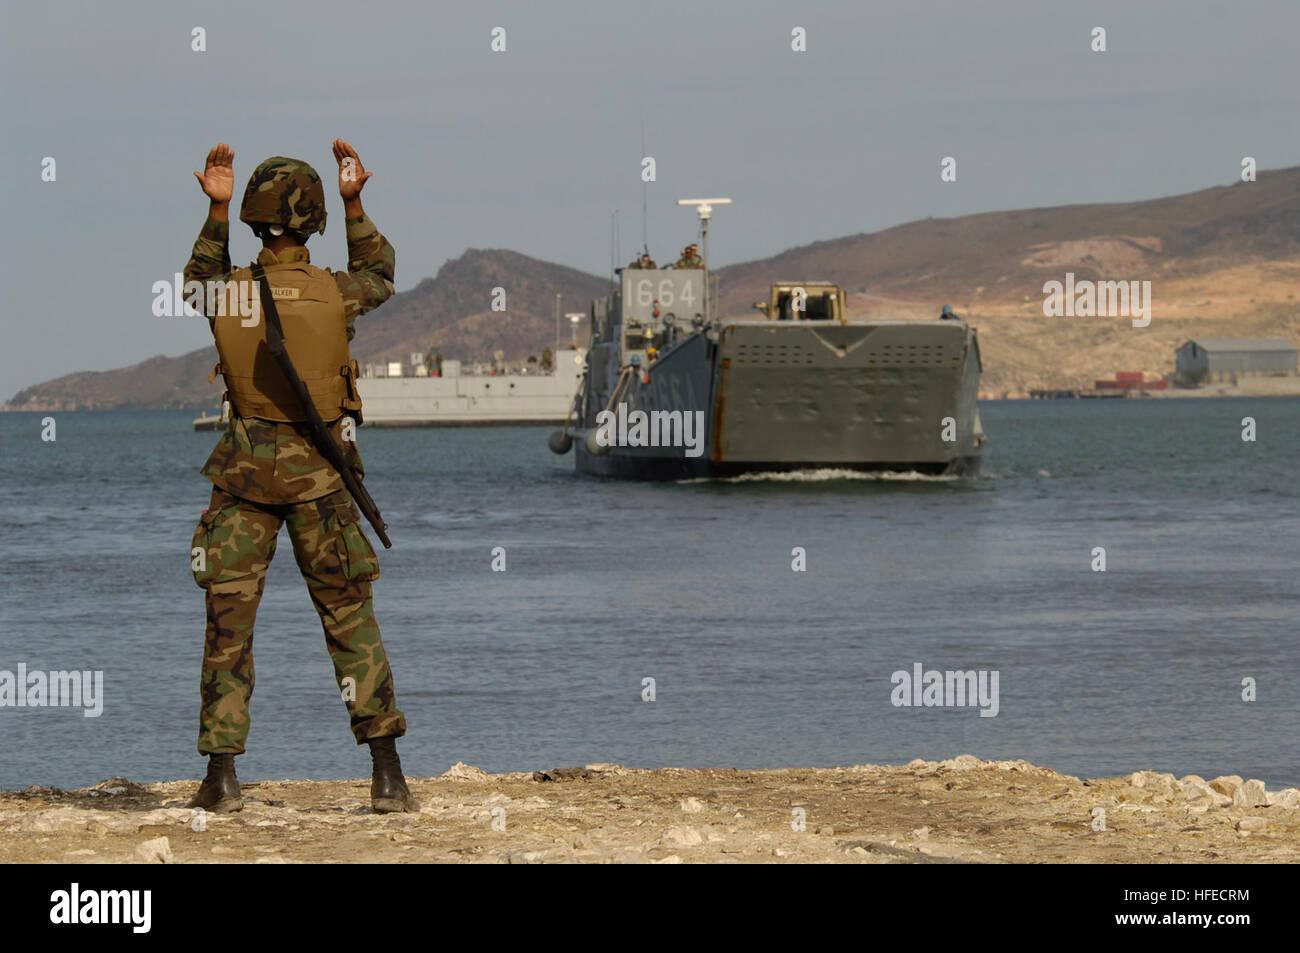 050509-N-3642E-008 Gonaives, Haiti (May 9, 2005) - Seaman Emanuel Walker from Beach Master Unit Two (BMU-2) directs - Stock Image